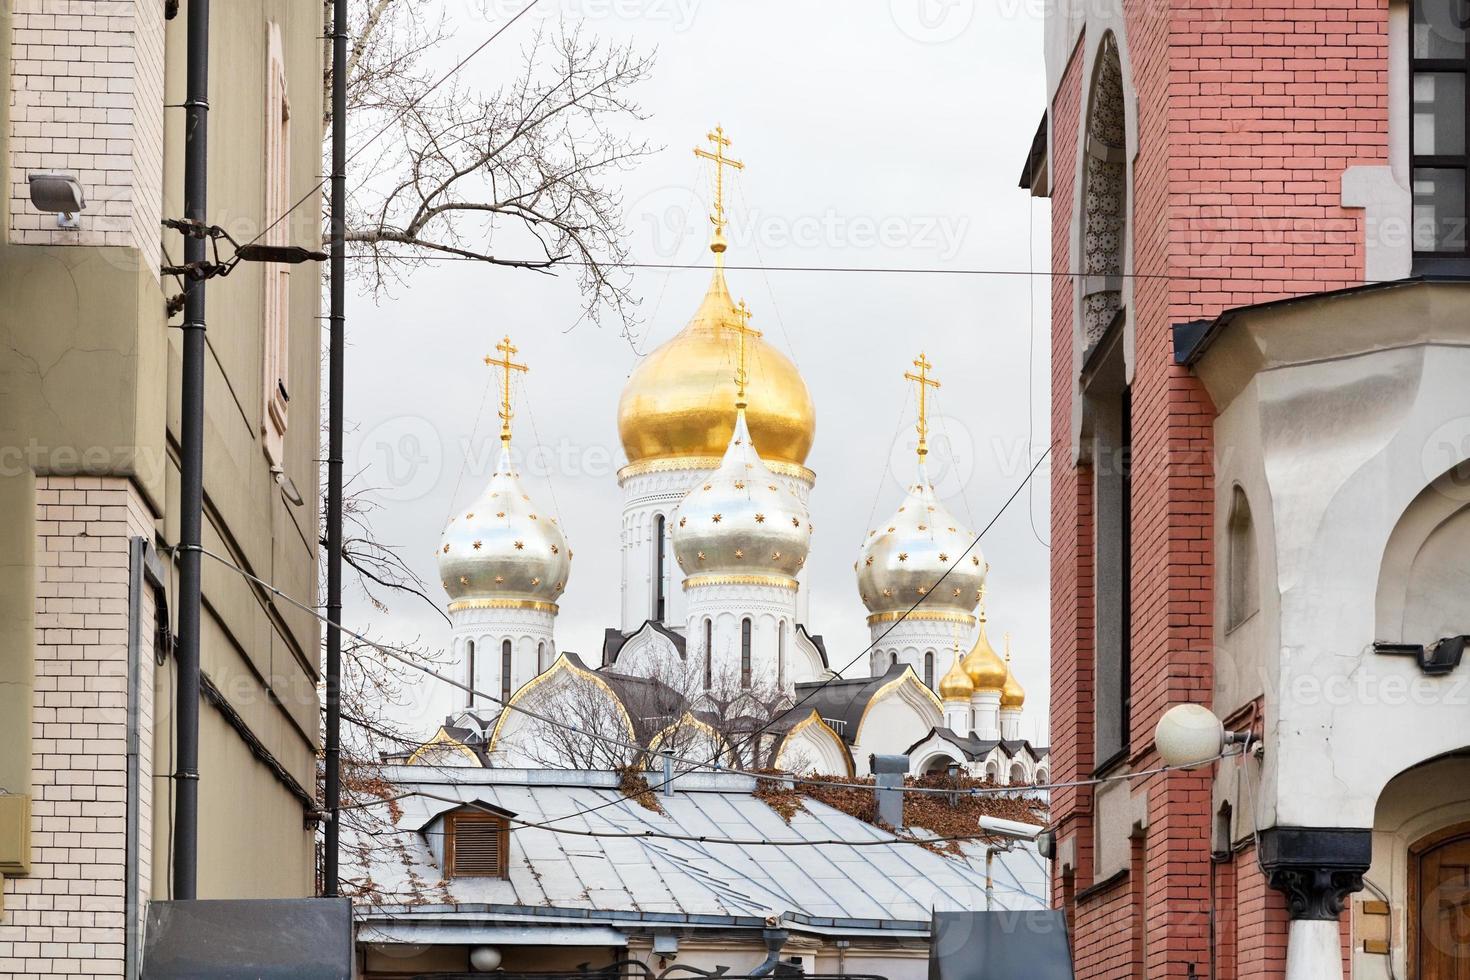 Dôme de la cathédrale du monastère Zachatyevsky à Moscou photo